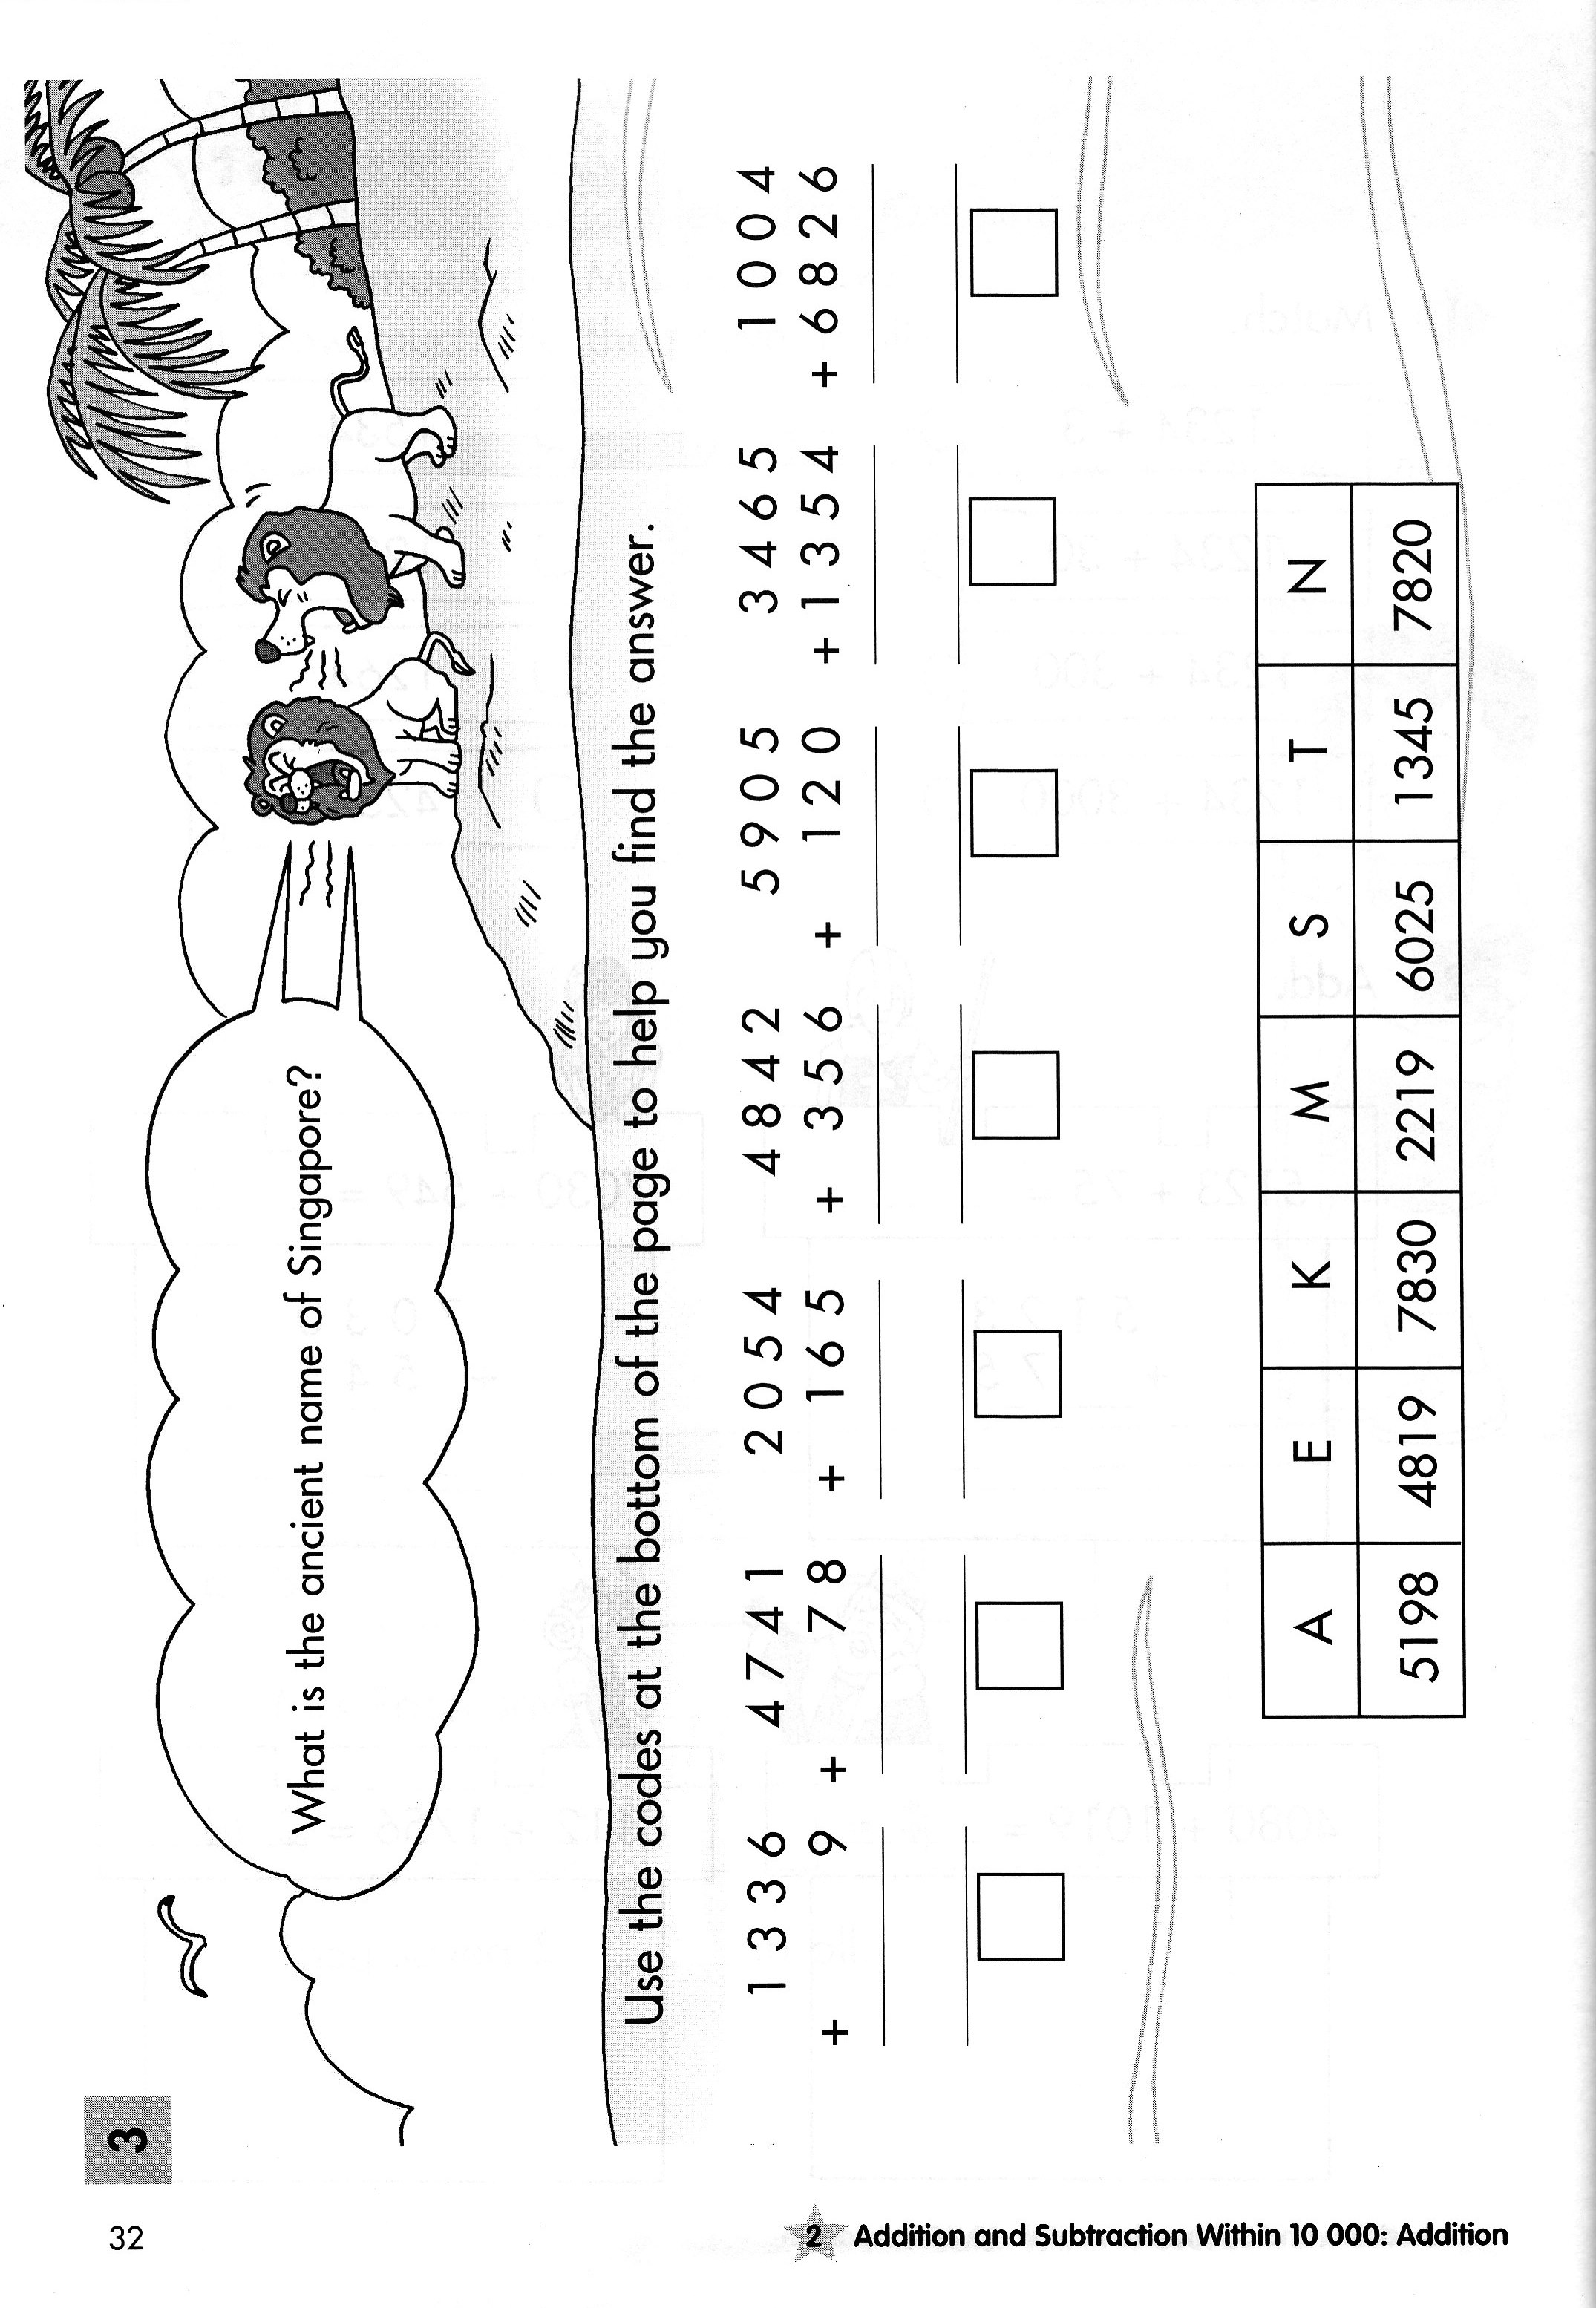 Comparing Singapore Math Materials: Workbooks | SingaporeMathSource